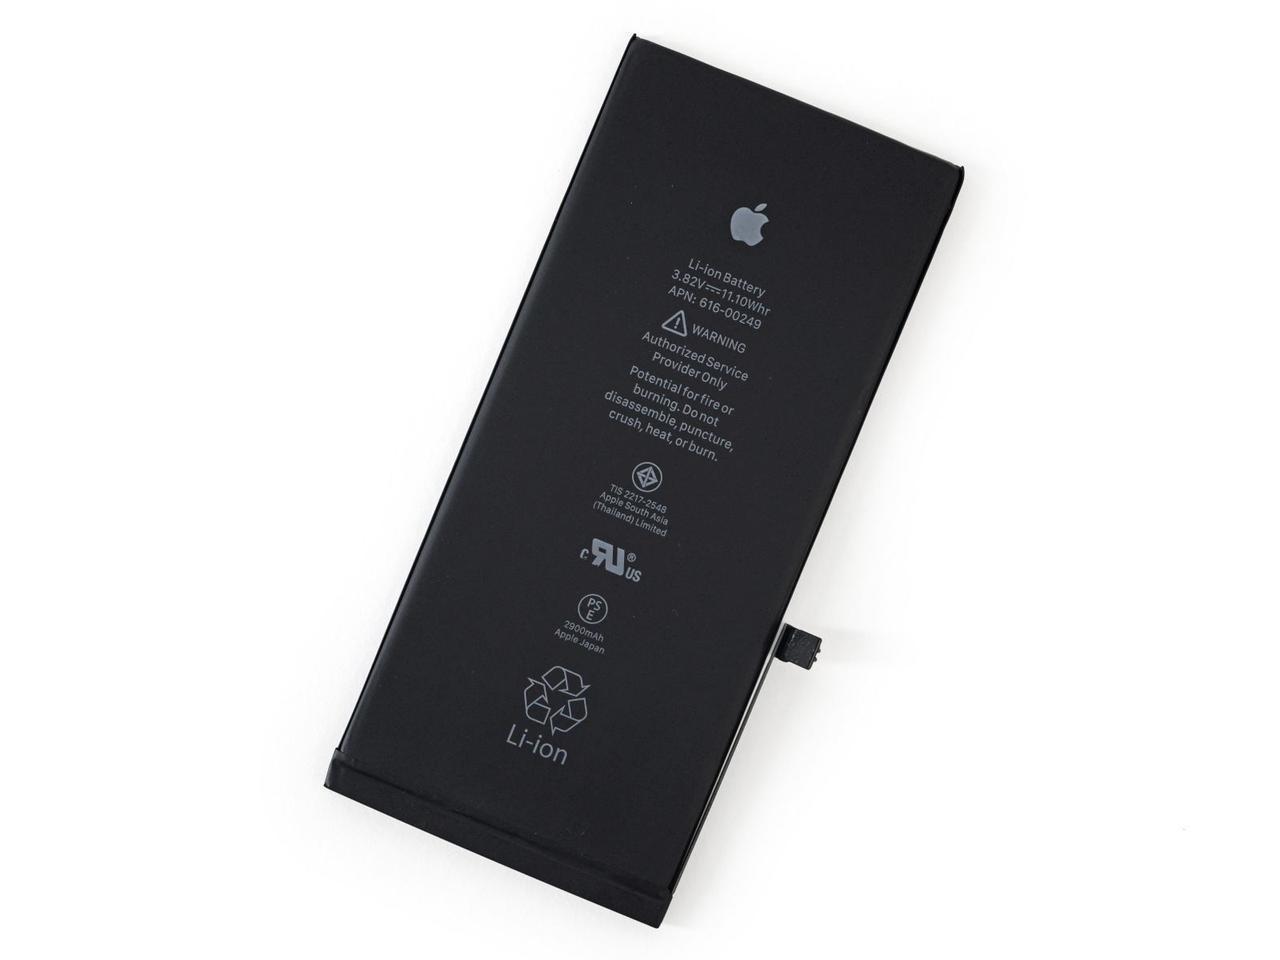 ГАРАНТІЯ! Акумулятор / акб / батарея для iPhone 6s - Original ( Sony mfr батарея Li-ion 1715 mAh)